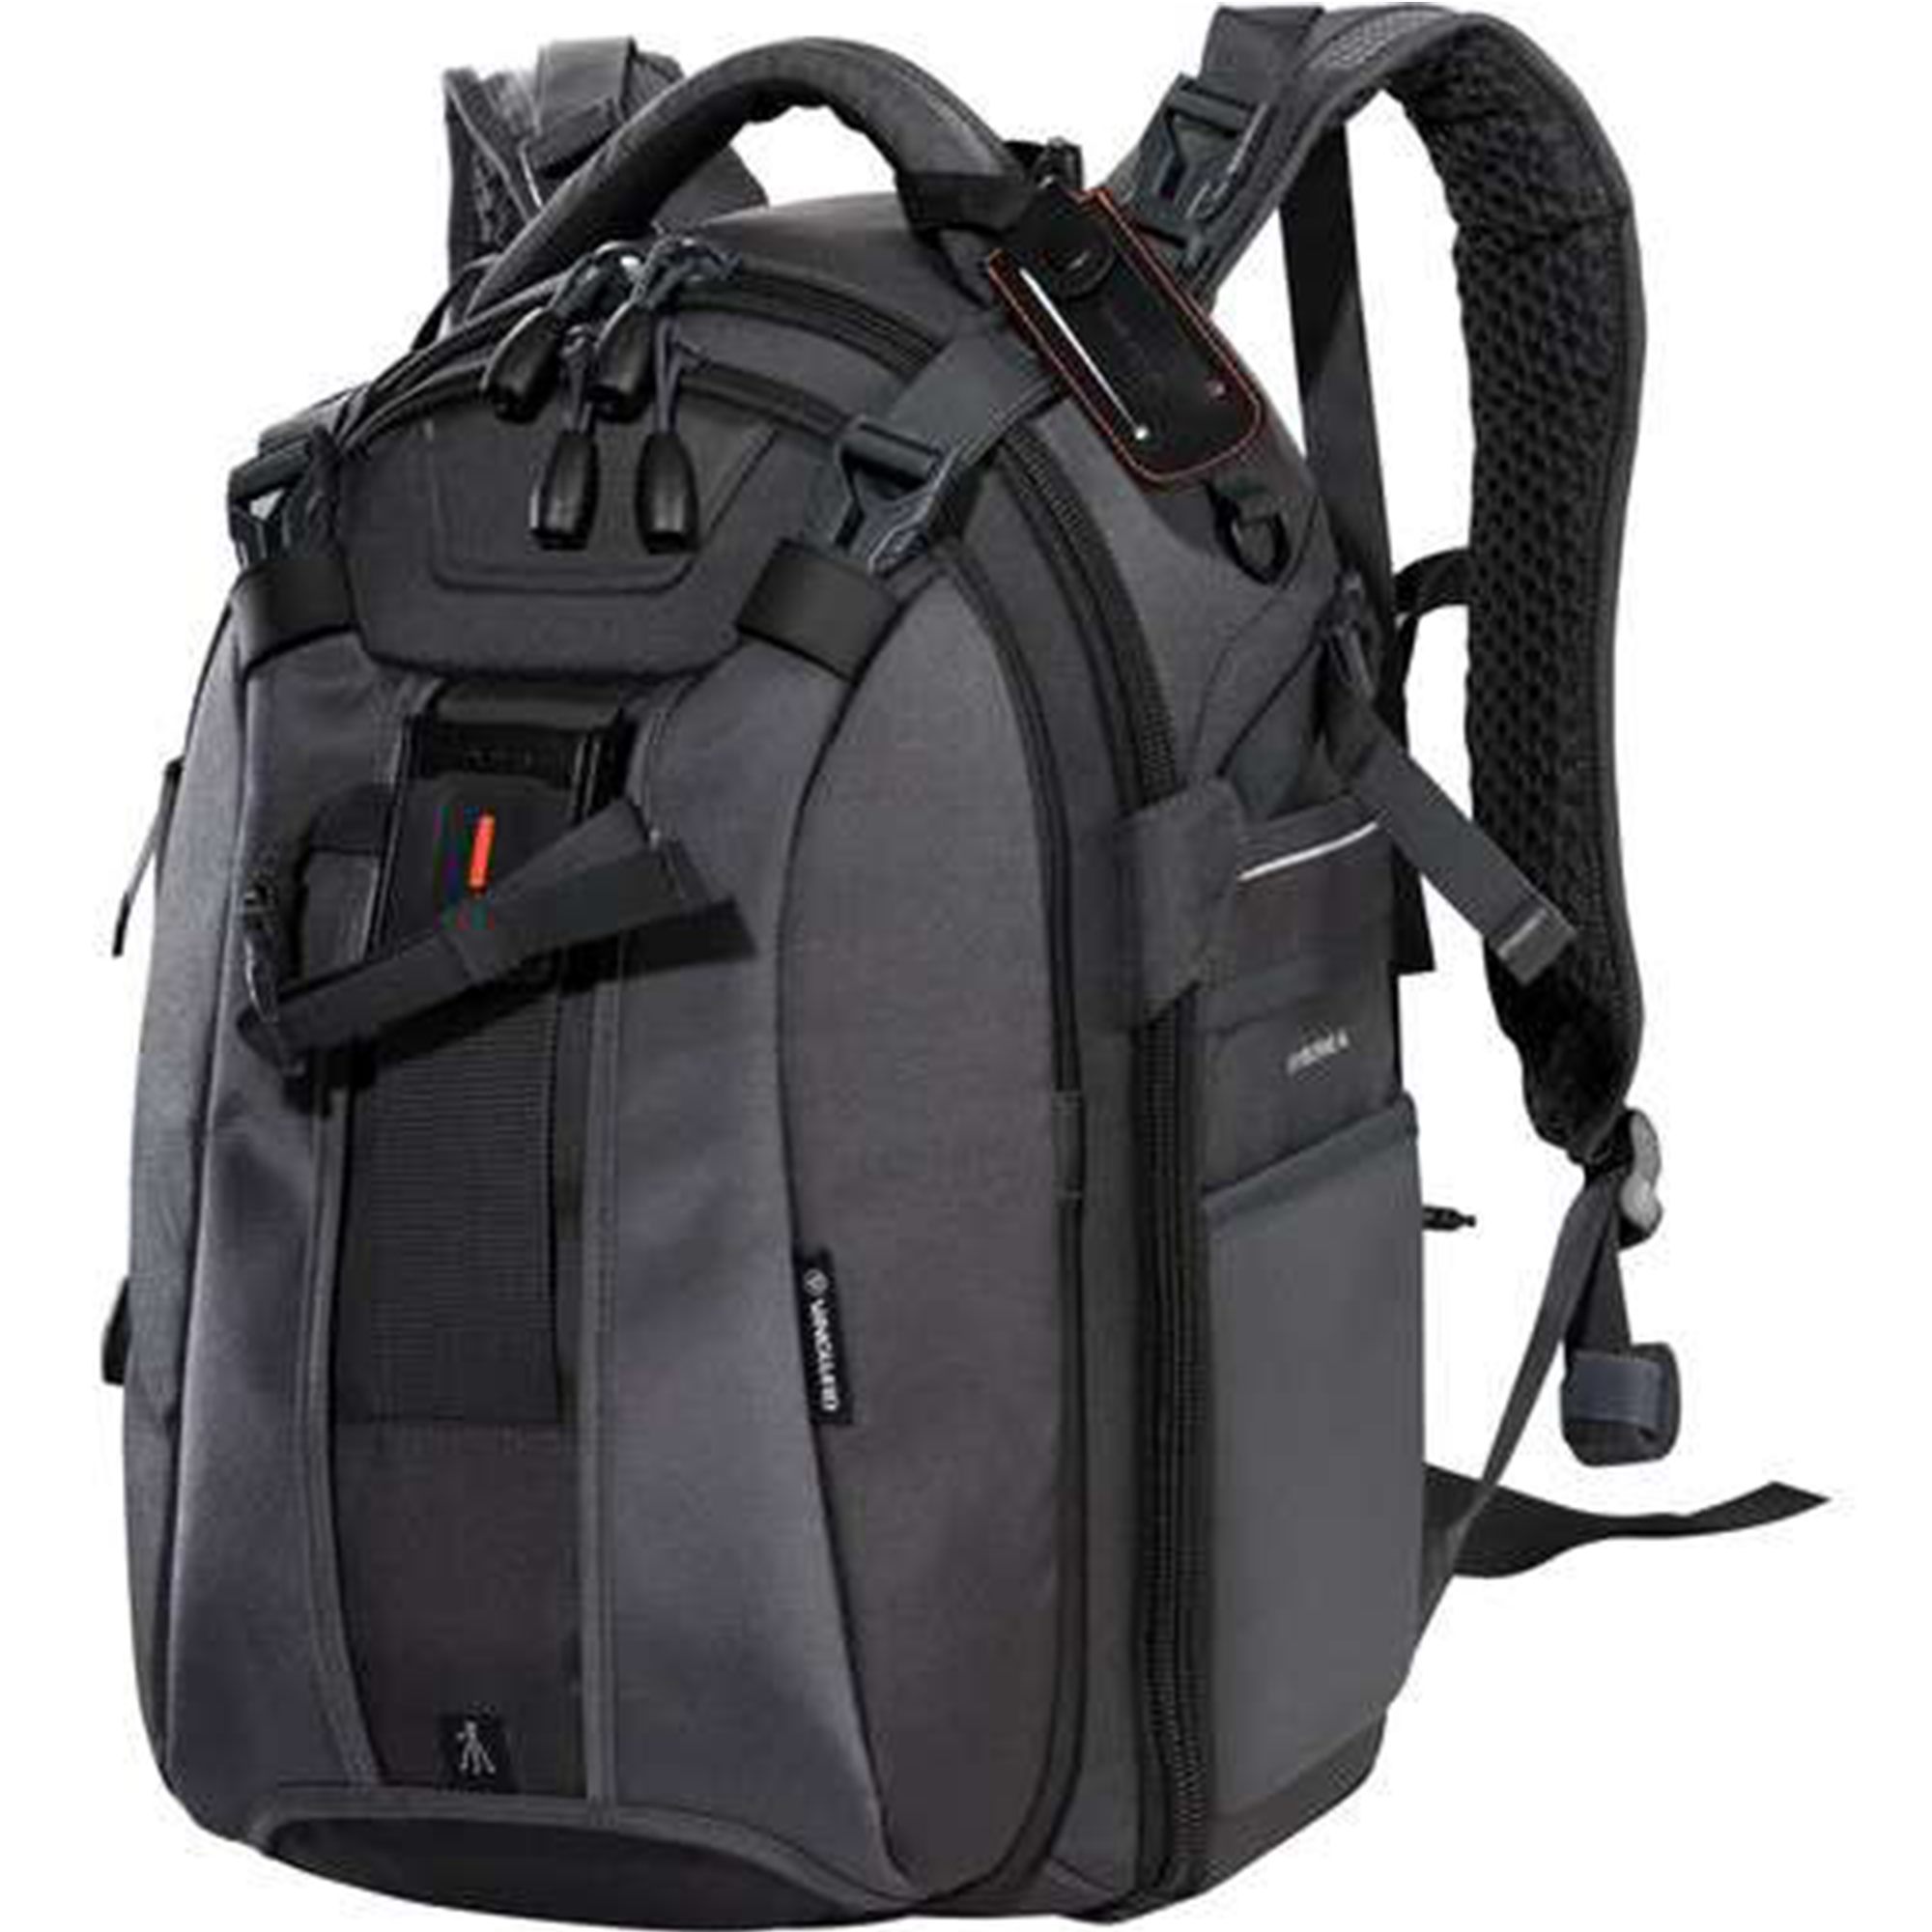 Vanguard Skyborne 49 Bag